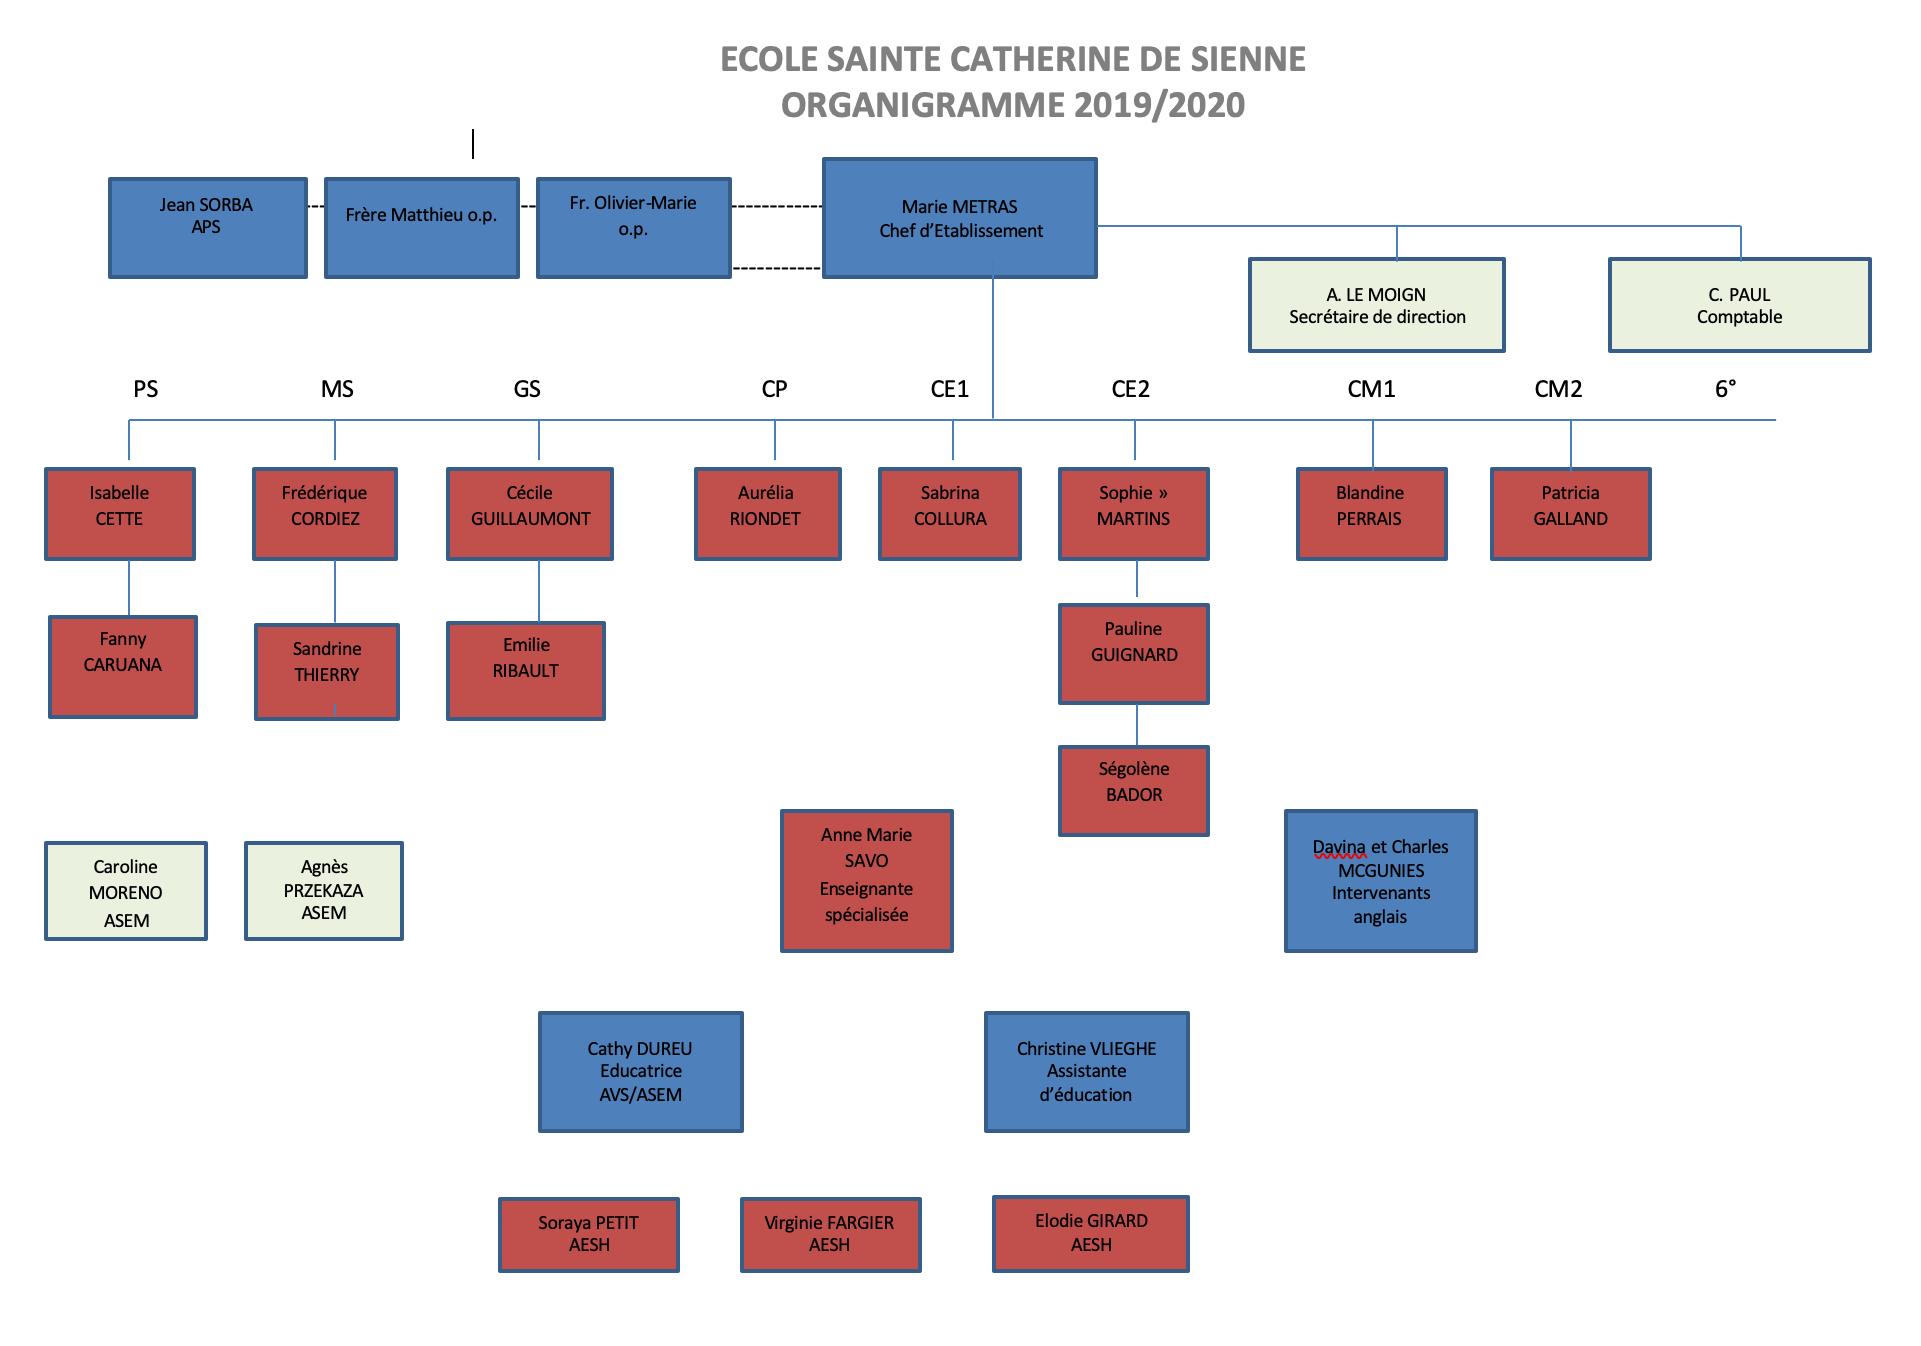 Organigramme École Ste Catherine 2019-2020